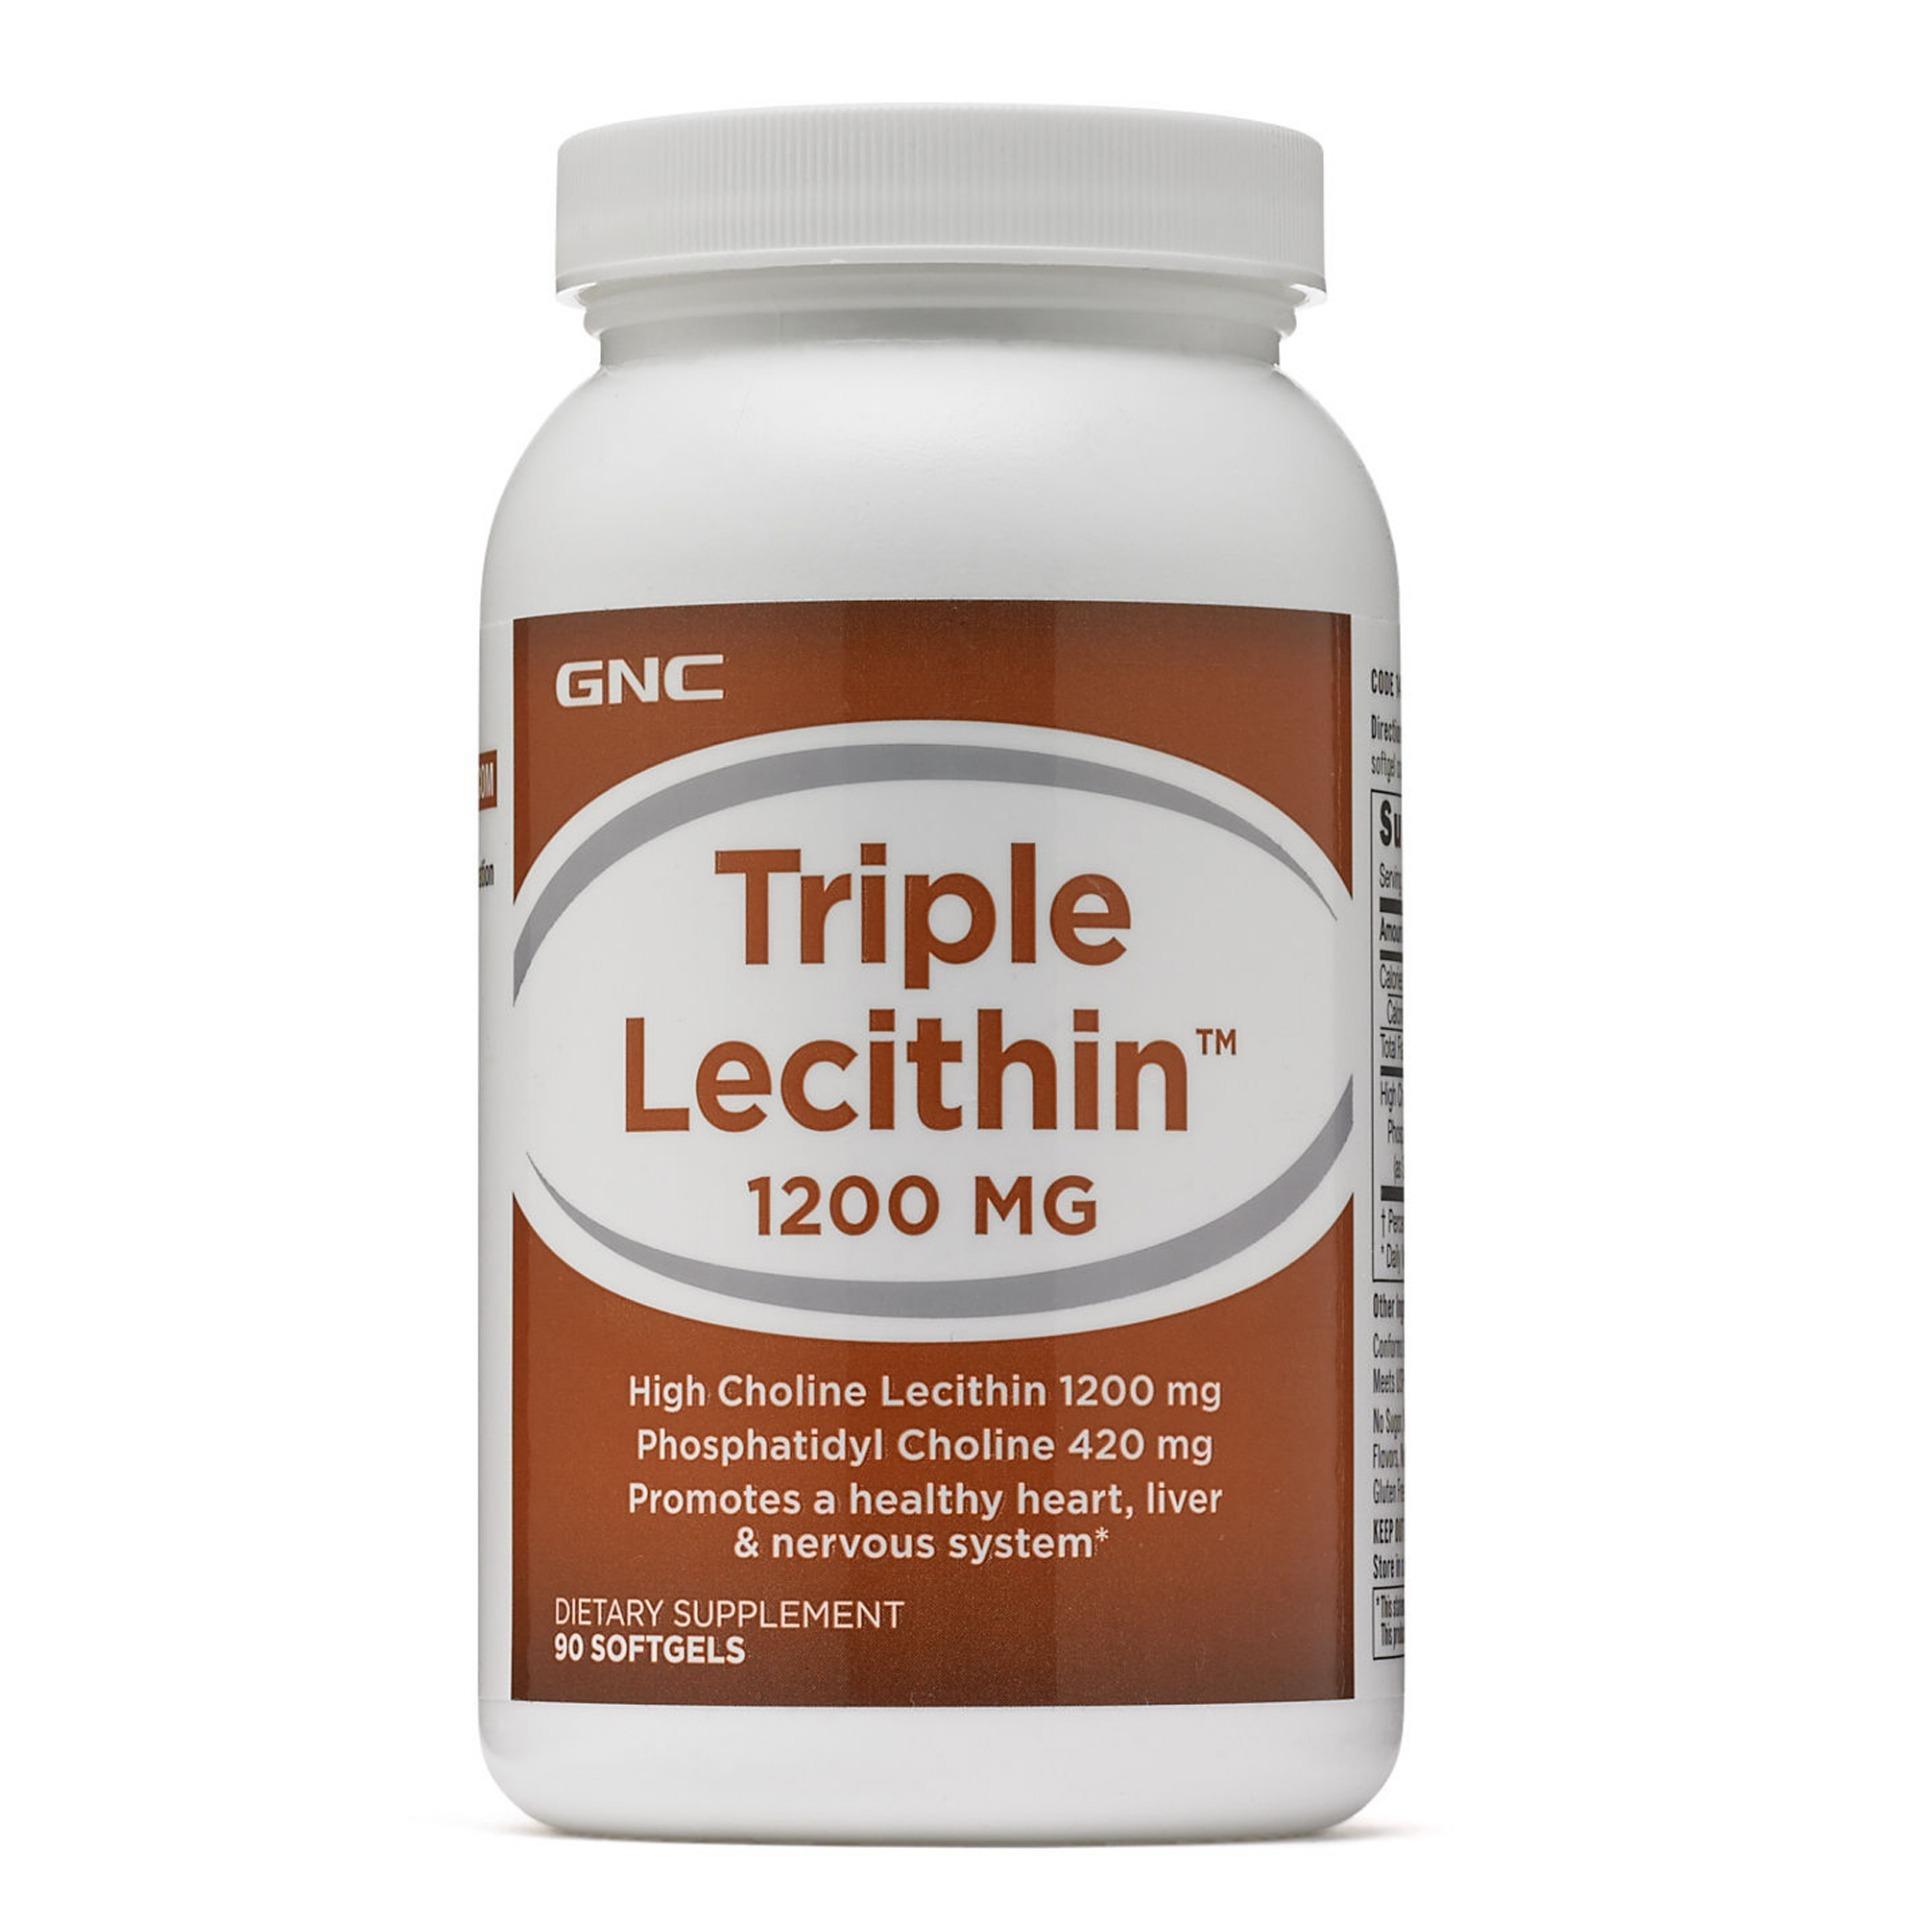 Best Deal Gnc Triple Lecithin 1200 Mg 90 Softgels